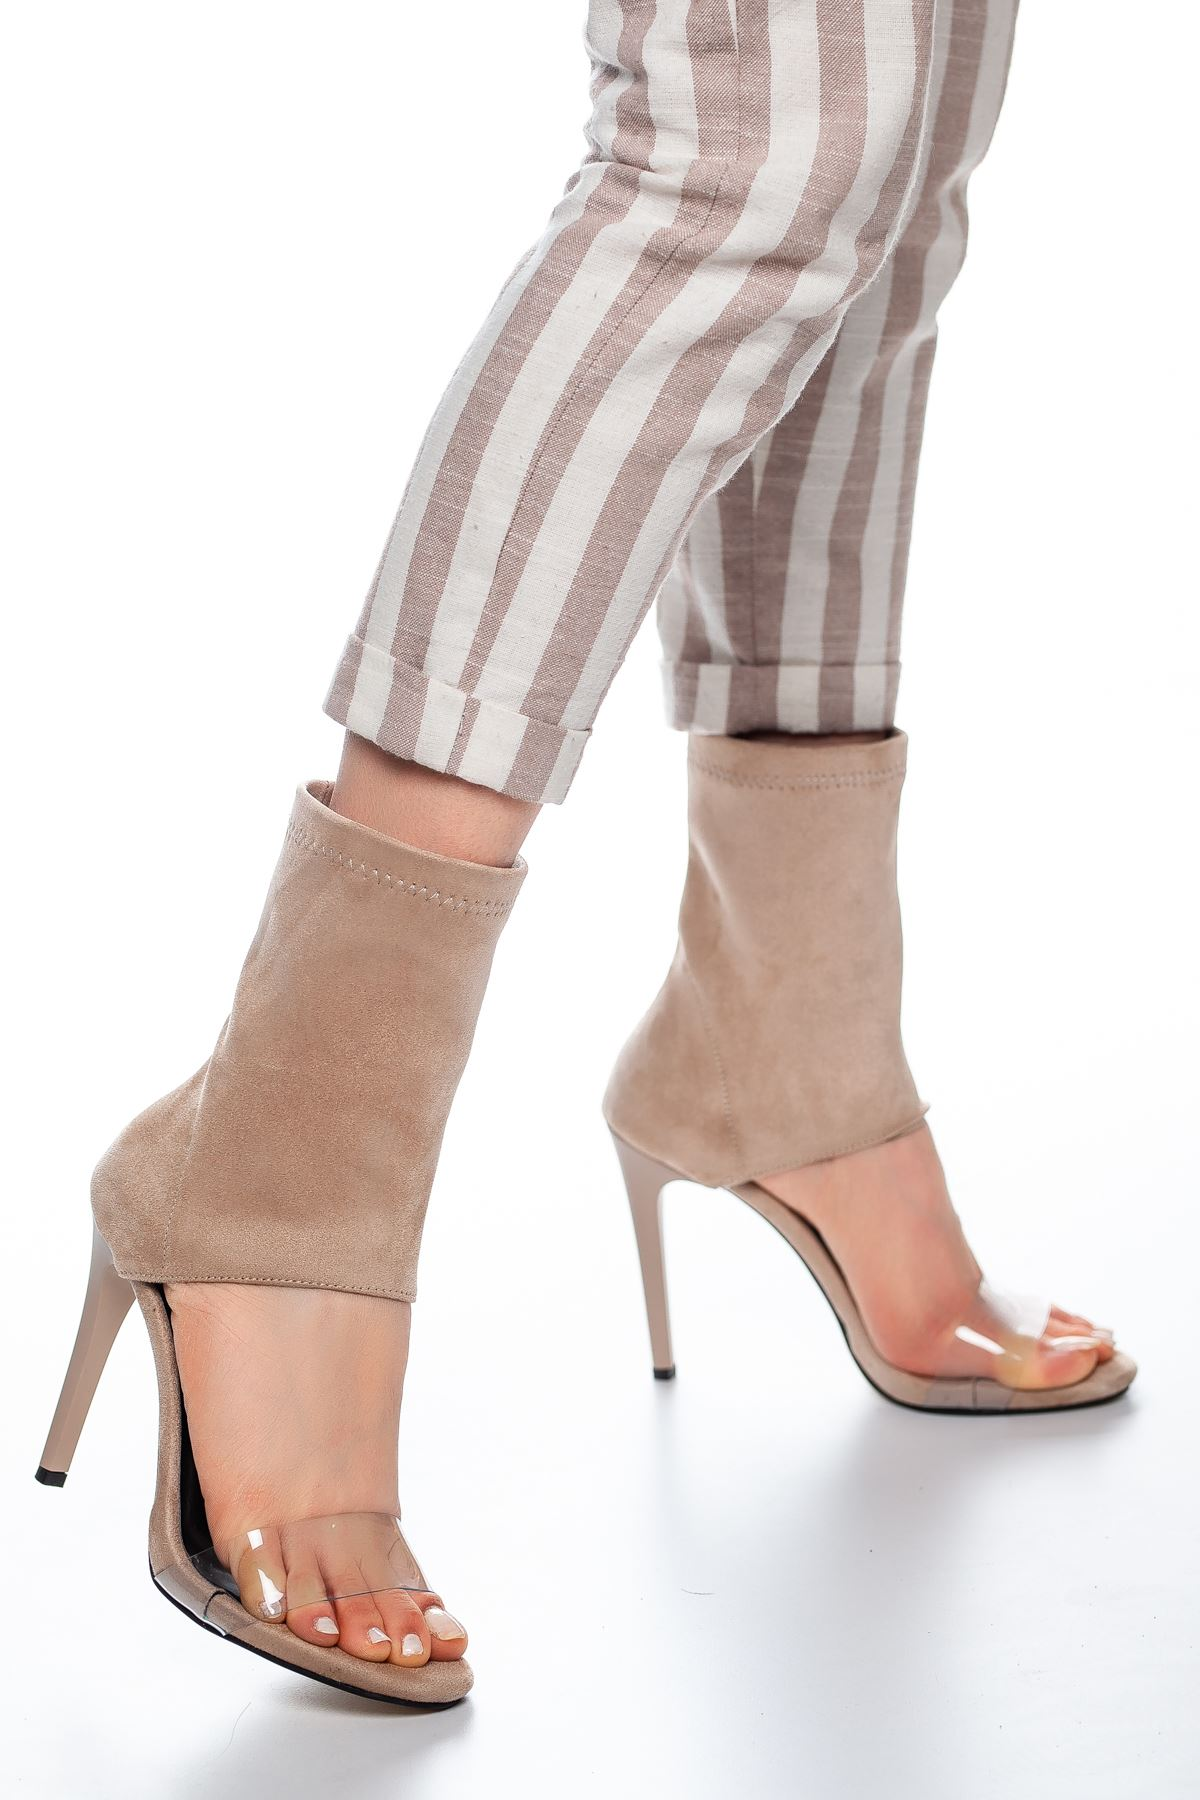 Ony Bant Detaylı Süet Topuklu Ayakkabı Ten